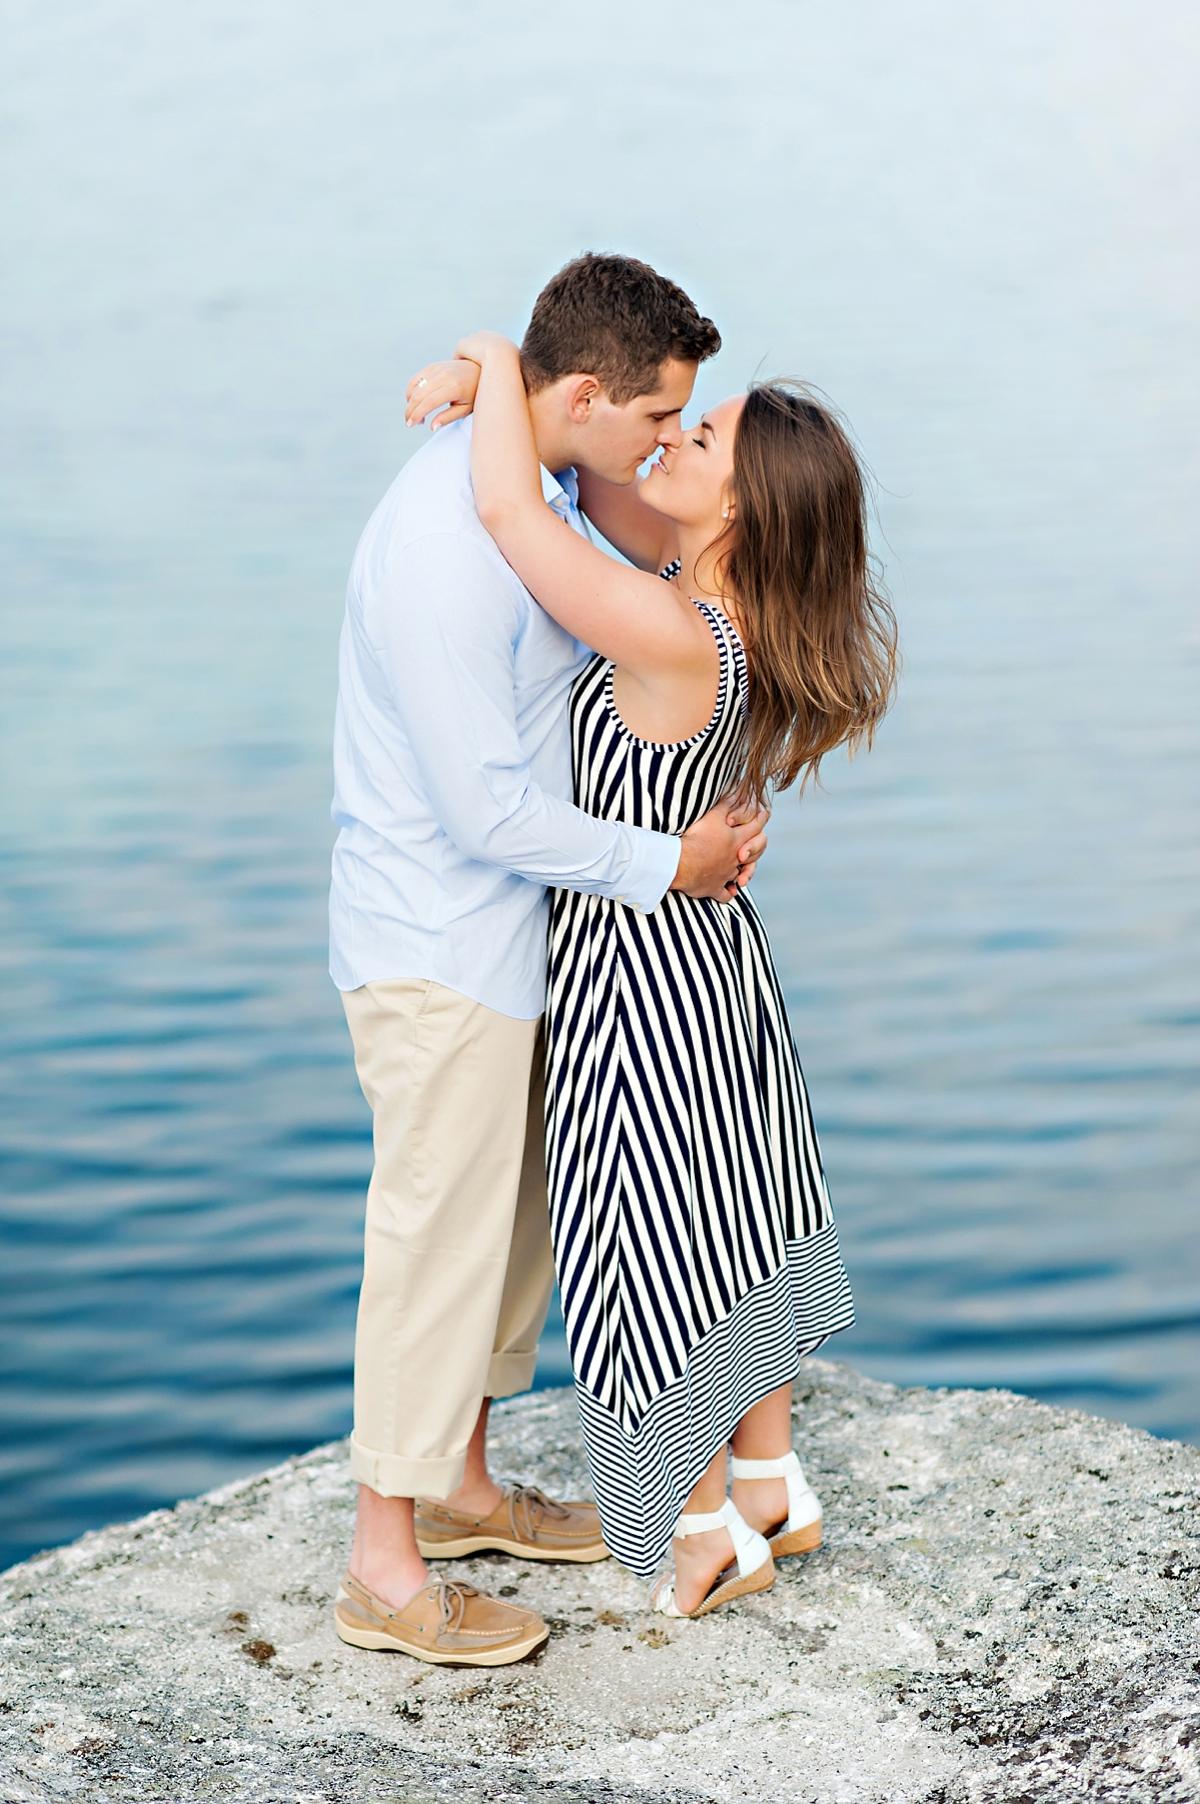 Nova-Scotia-Coastal-Class-Engagement-Shoot-Candace-Berry-Photography39.jpg